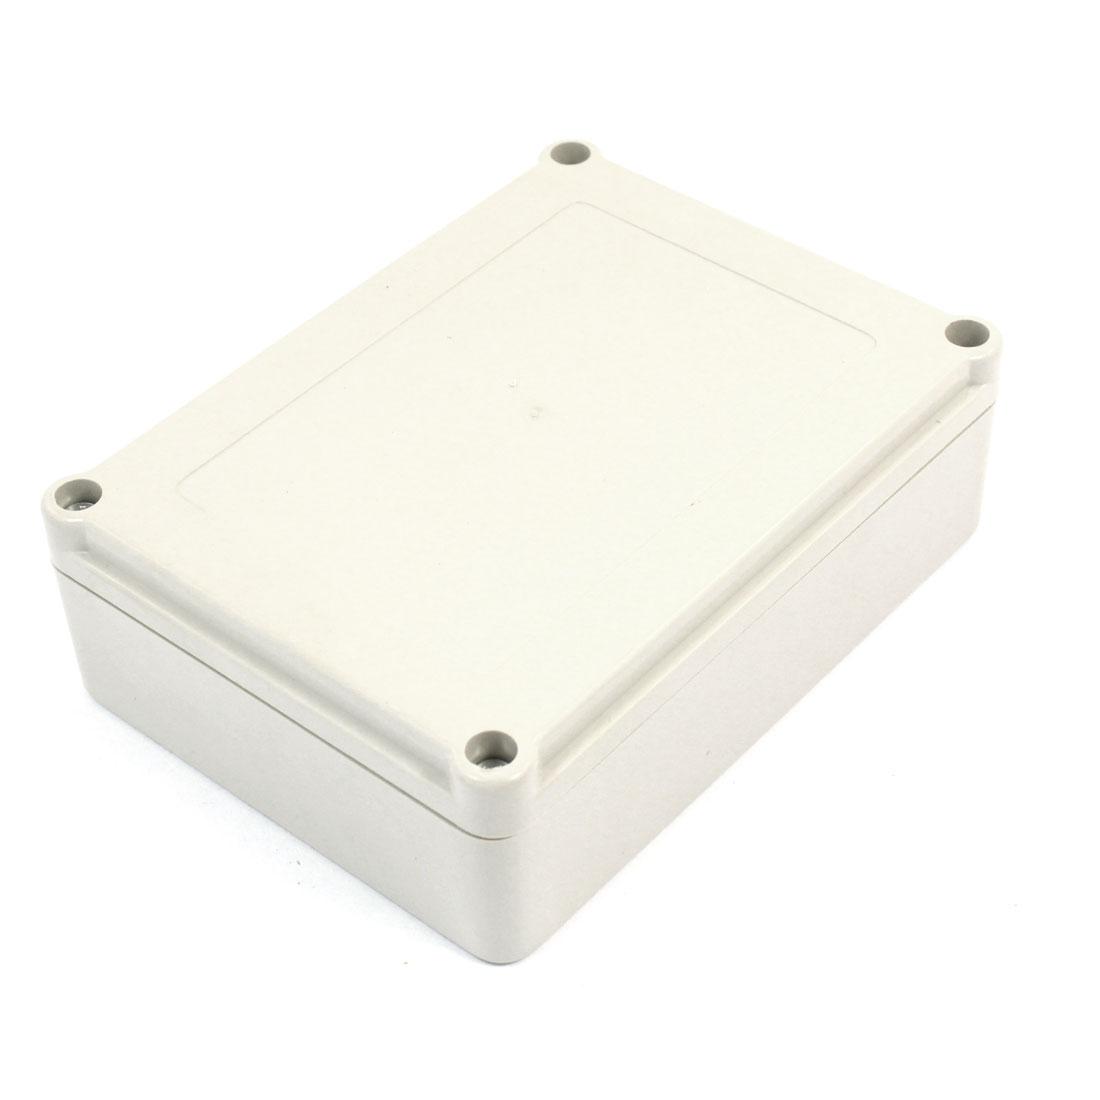 Rectangular Plastic DIY Junction Box Case 140 x 105 x 45mm